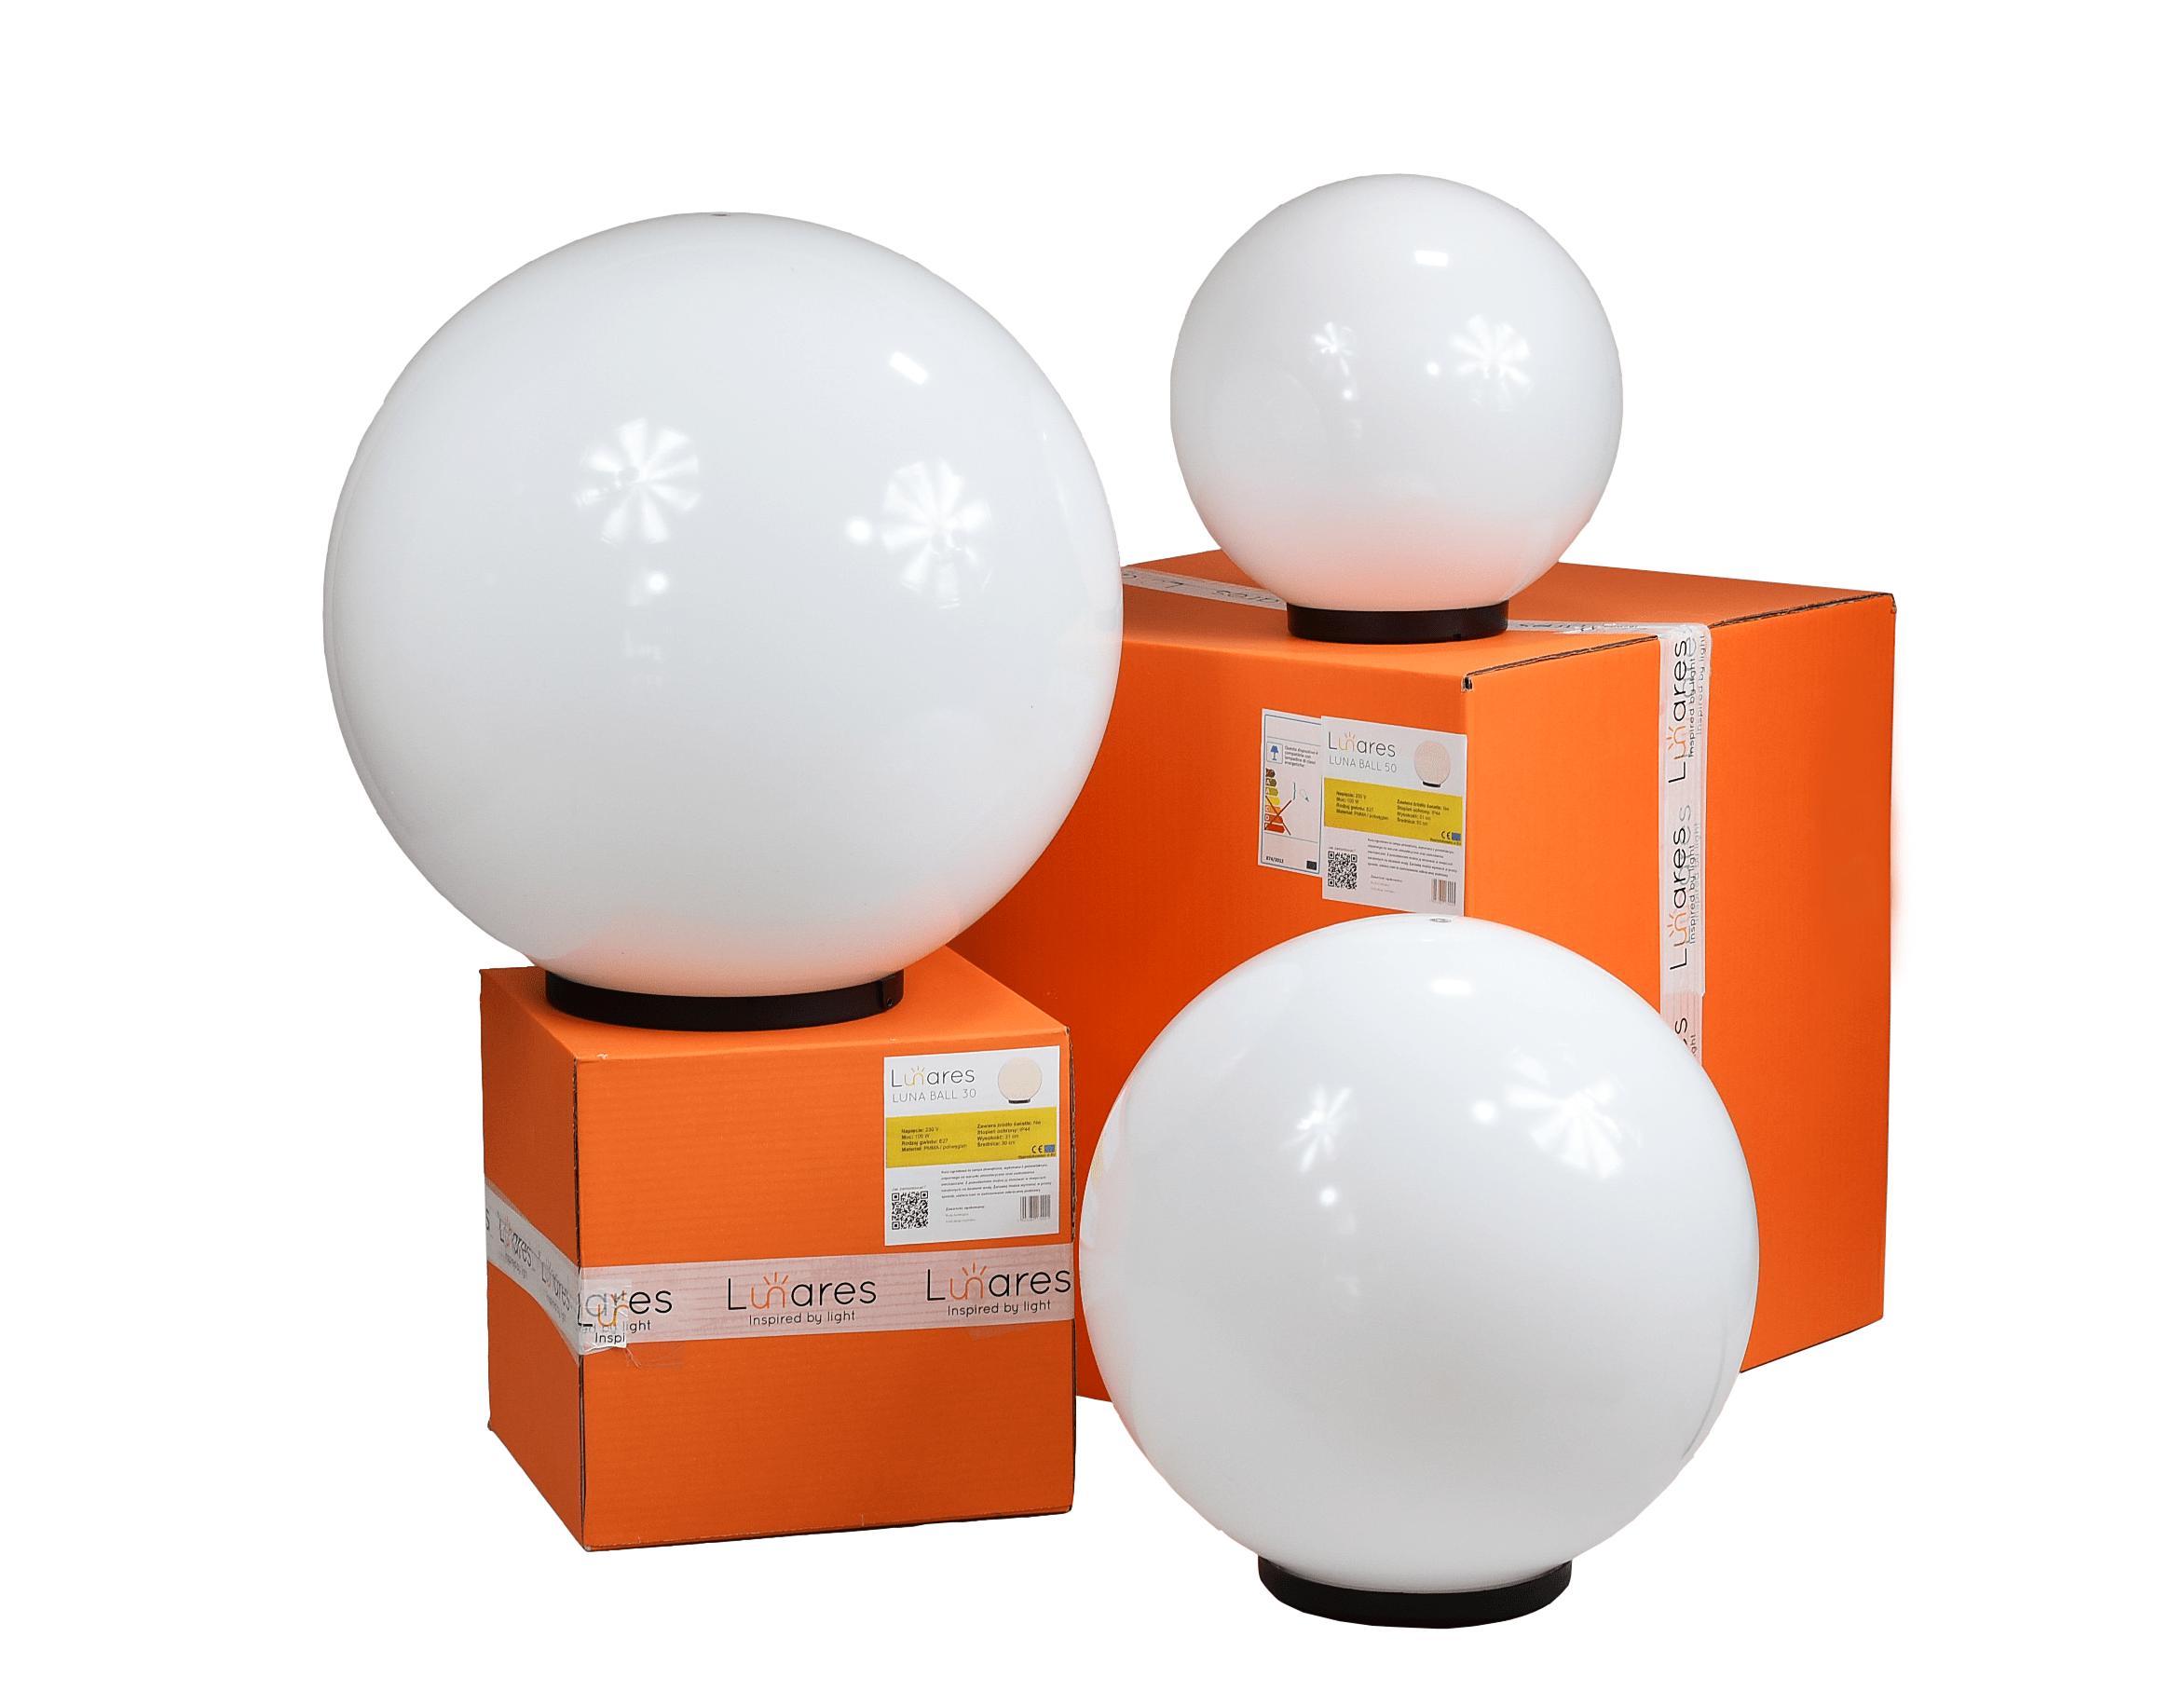 Garden Balls Decorative - Luna Balls 30, 40, 50cm + RGBW Bulbs with Remote Control